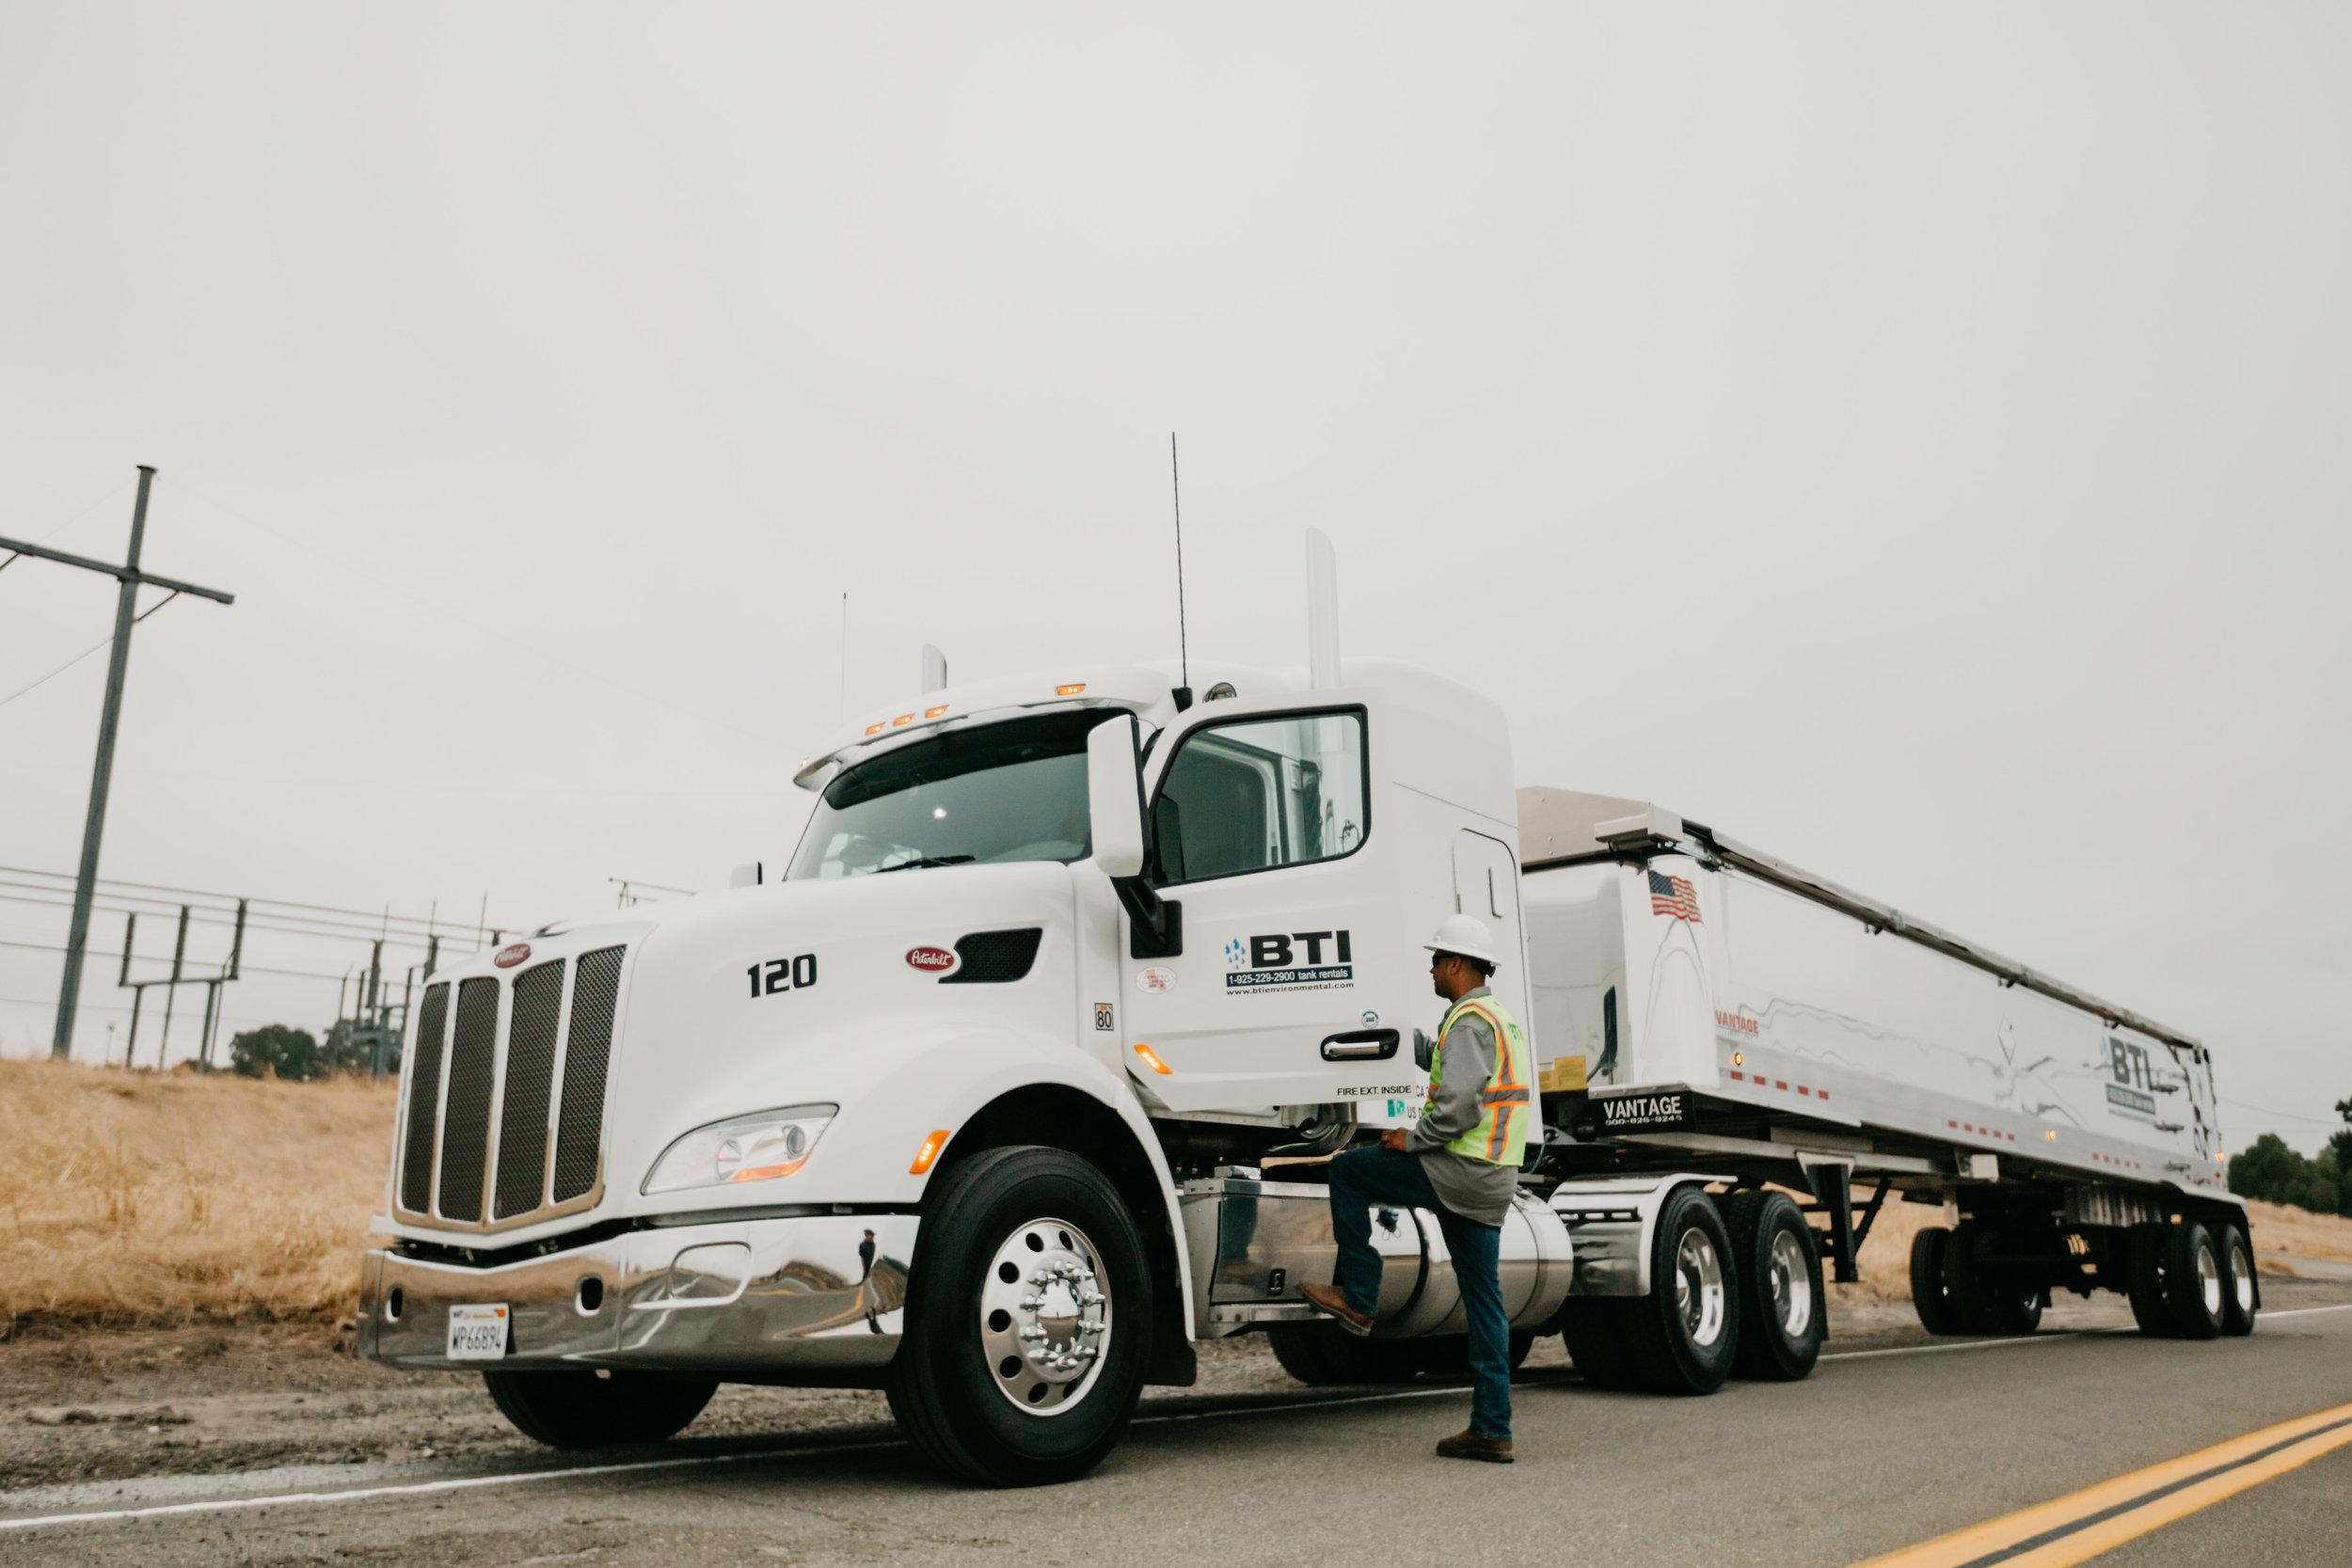 BTI Truck and Employee